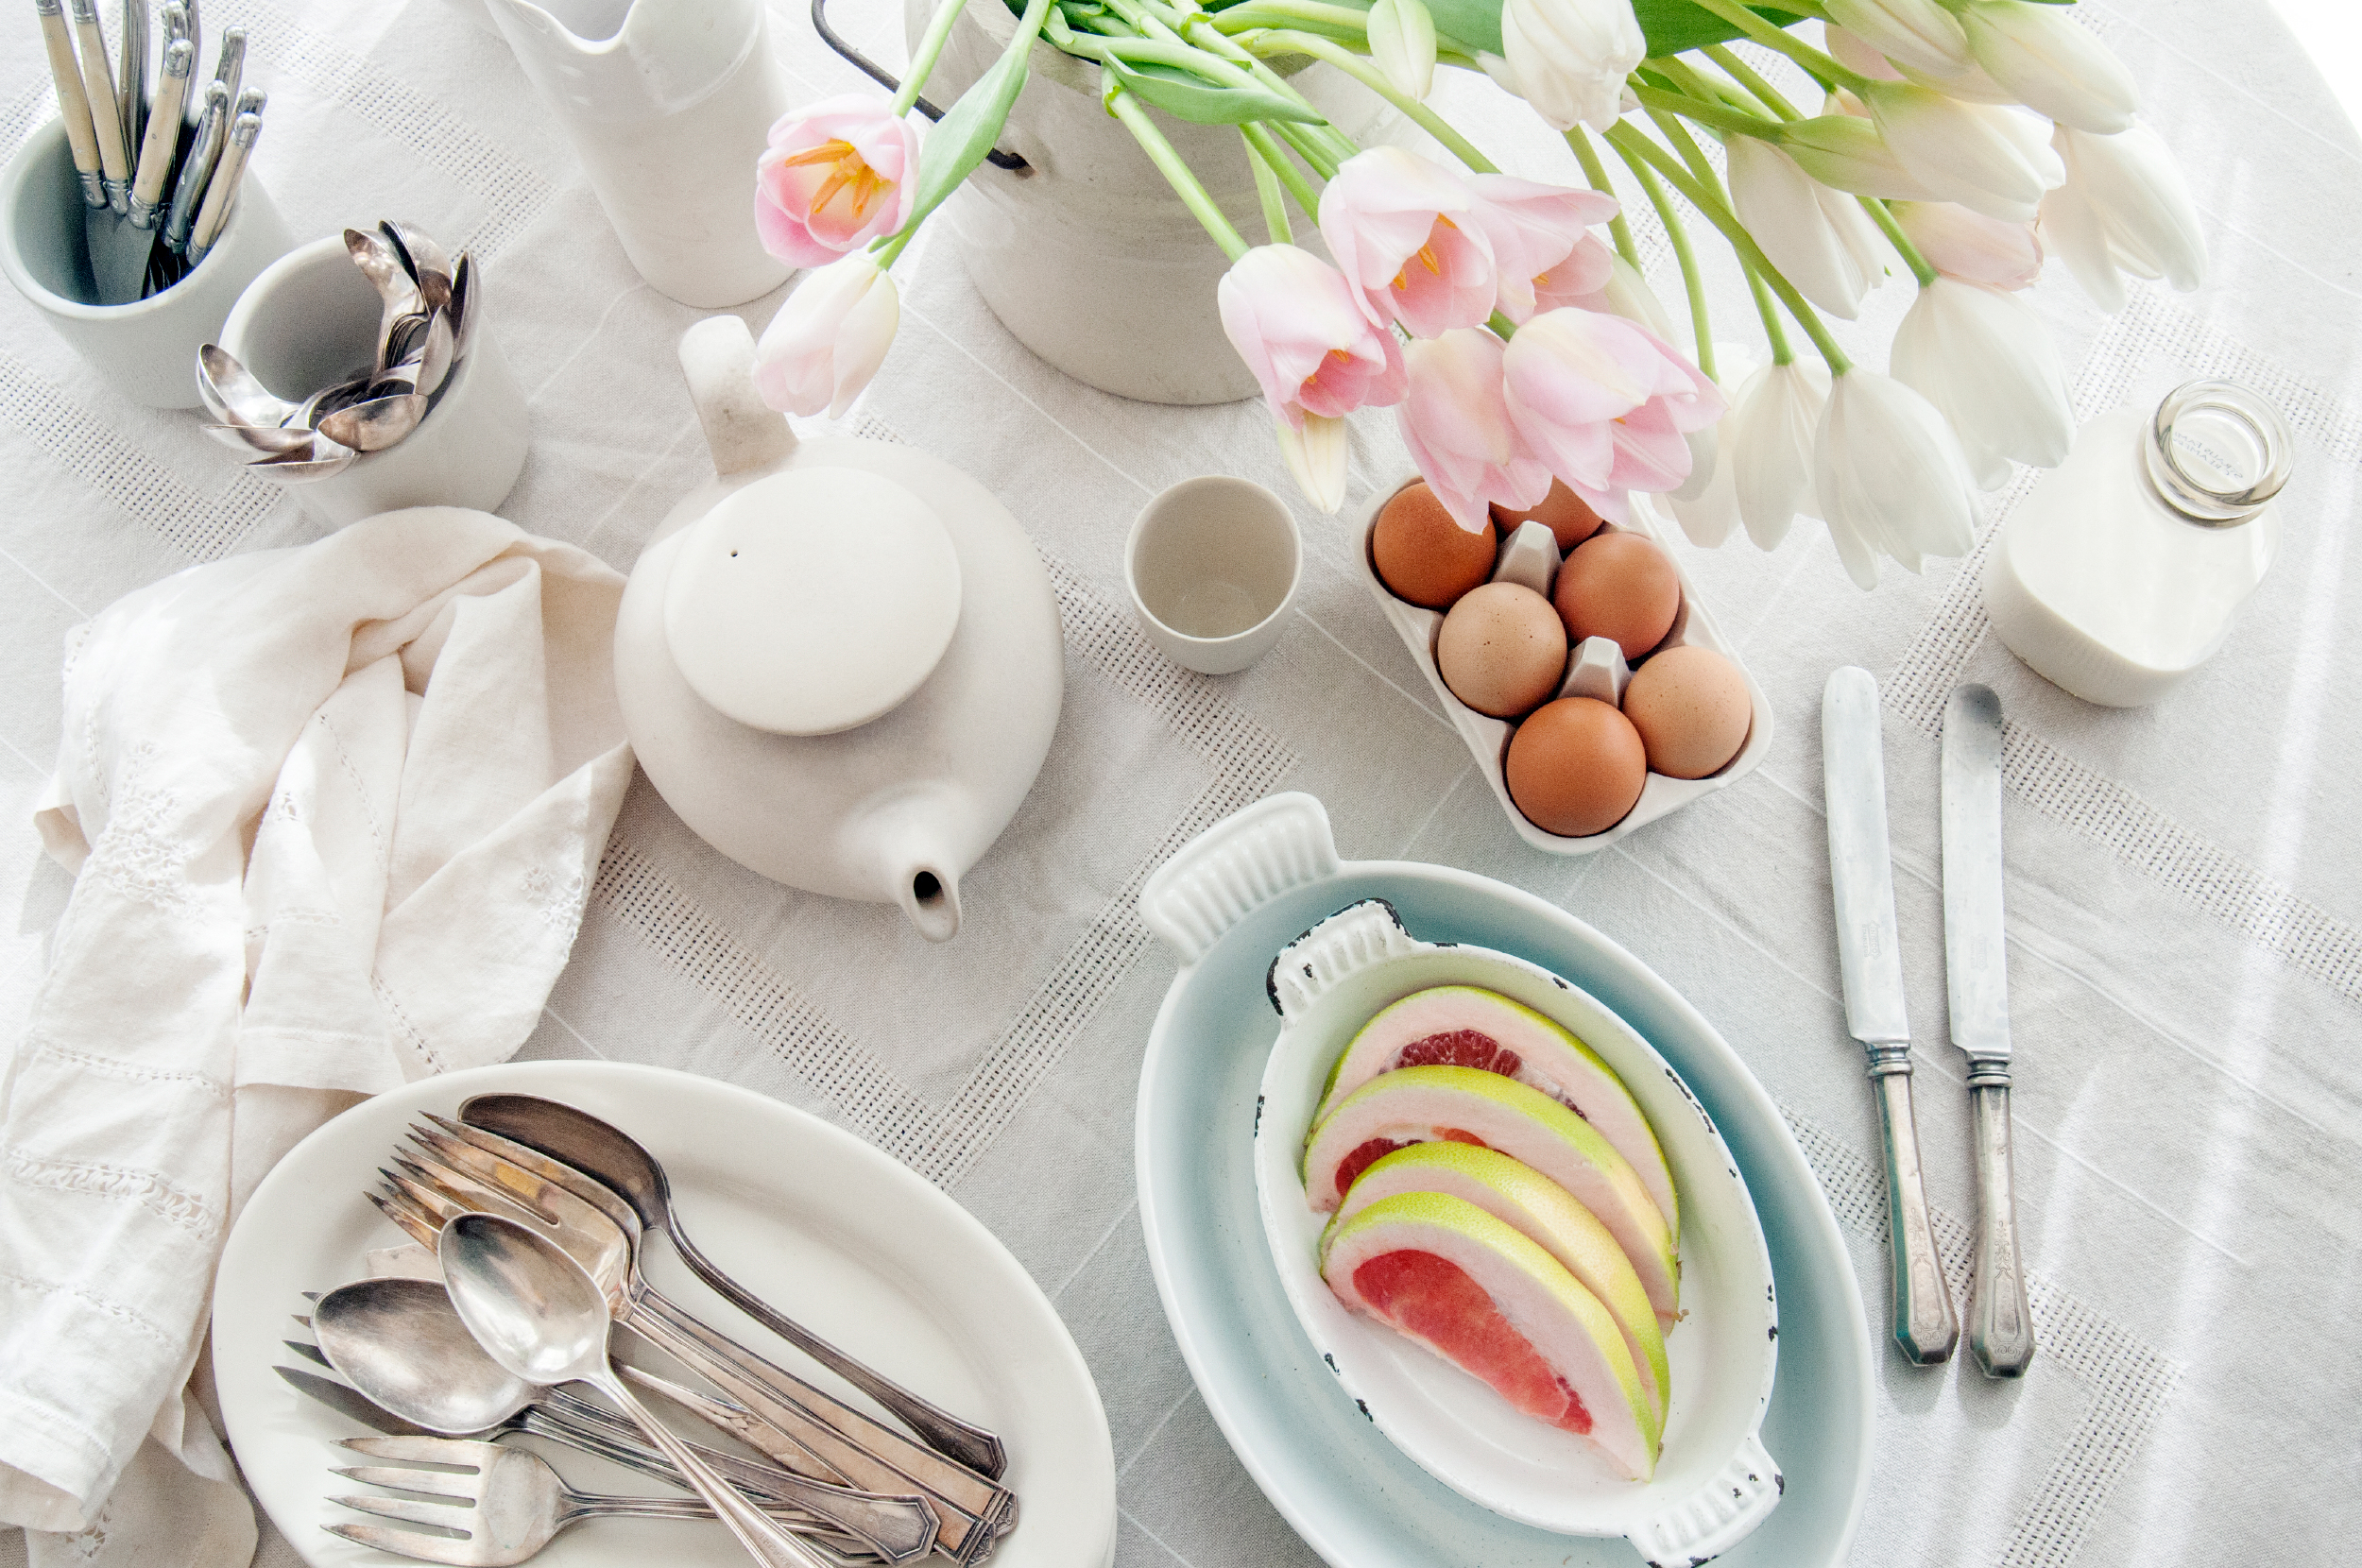 Lifestyle Breakfast